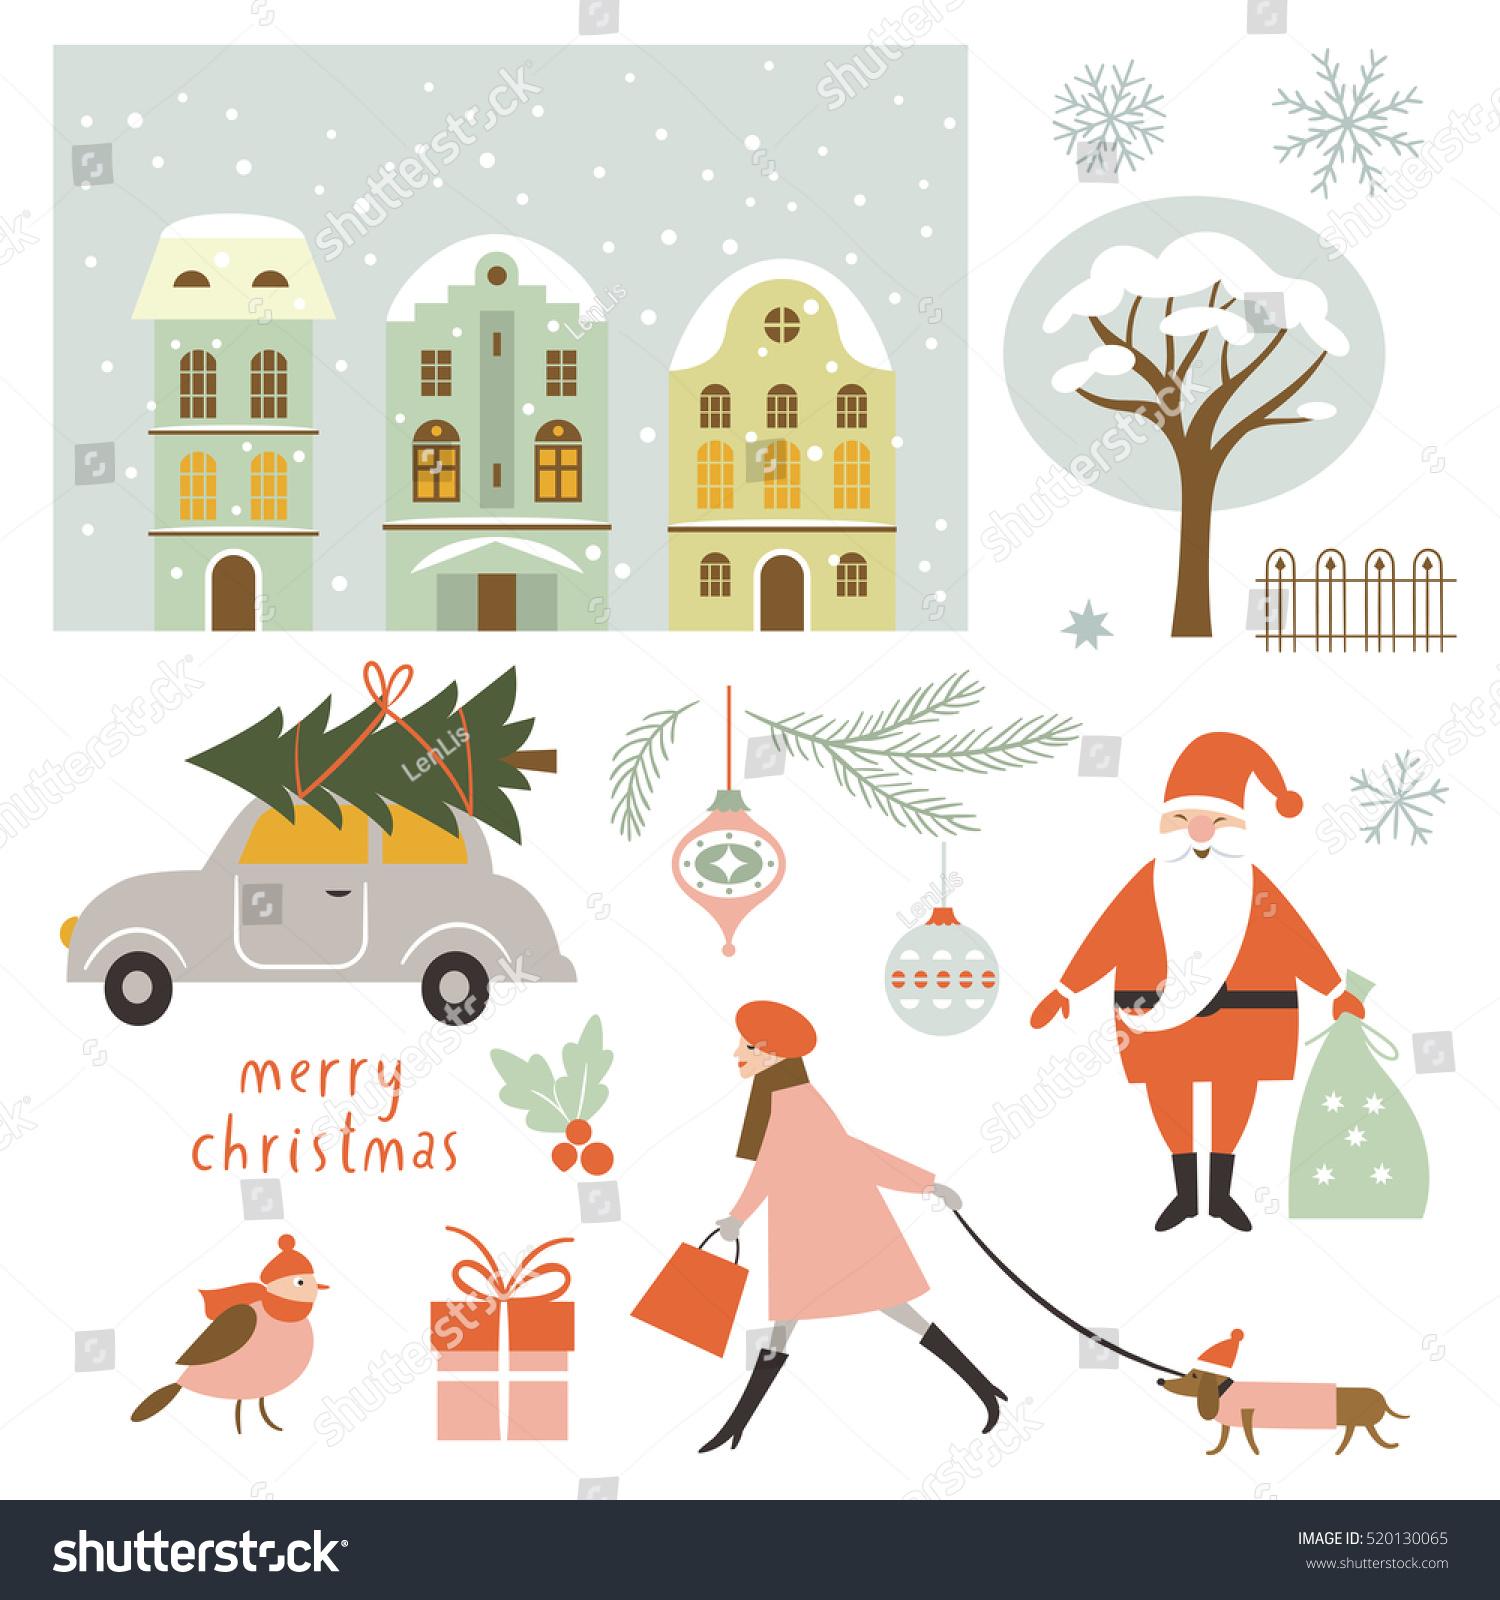 Set Christmas Vector Elements Illustrations Stock Vector (Royalty ...